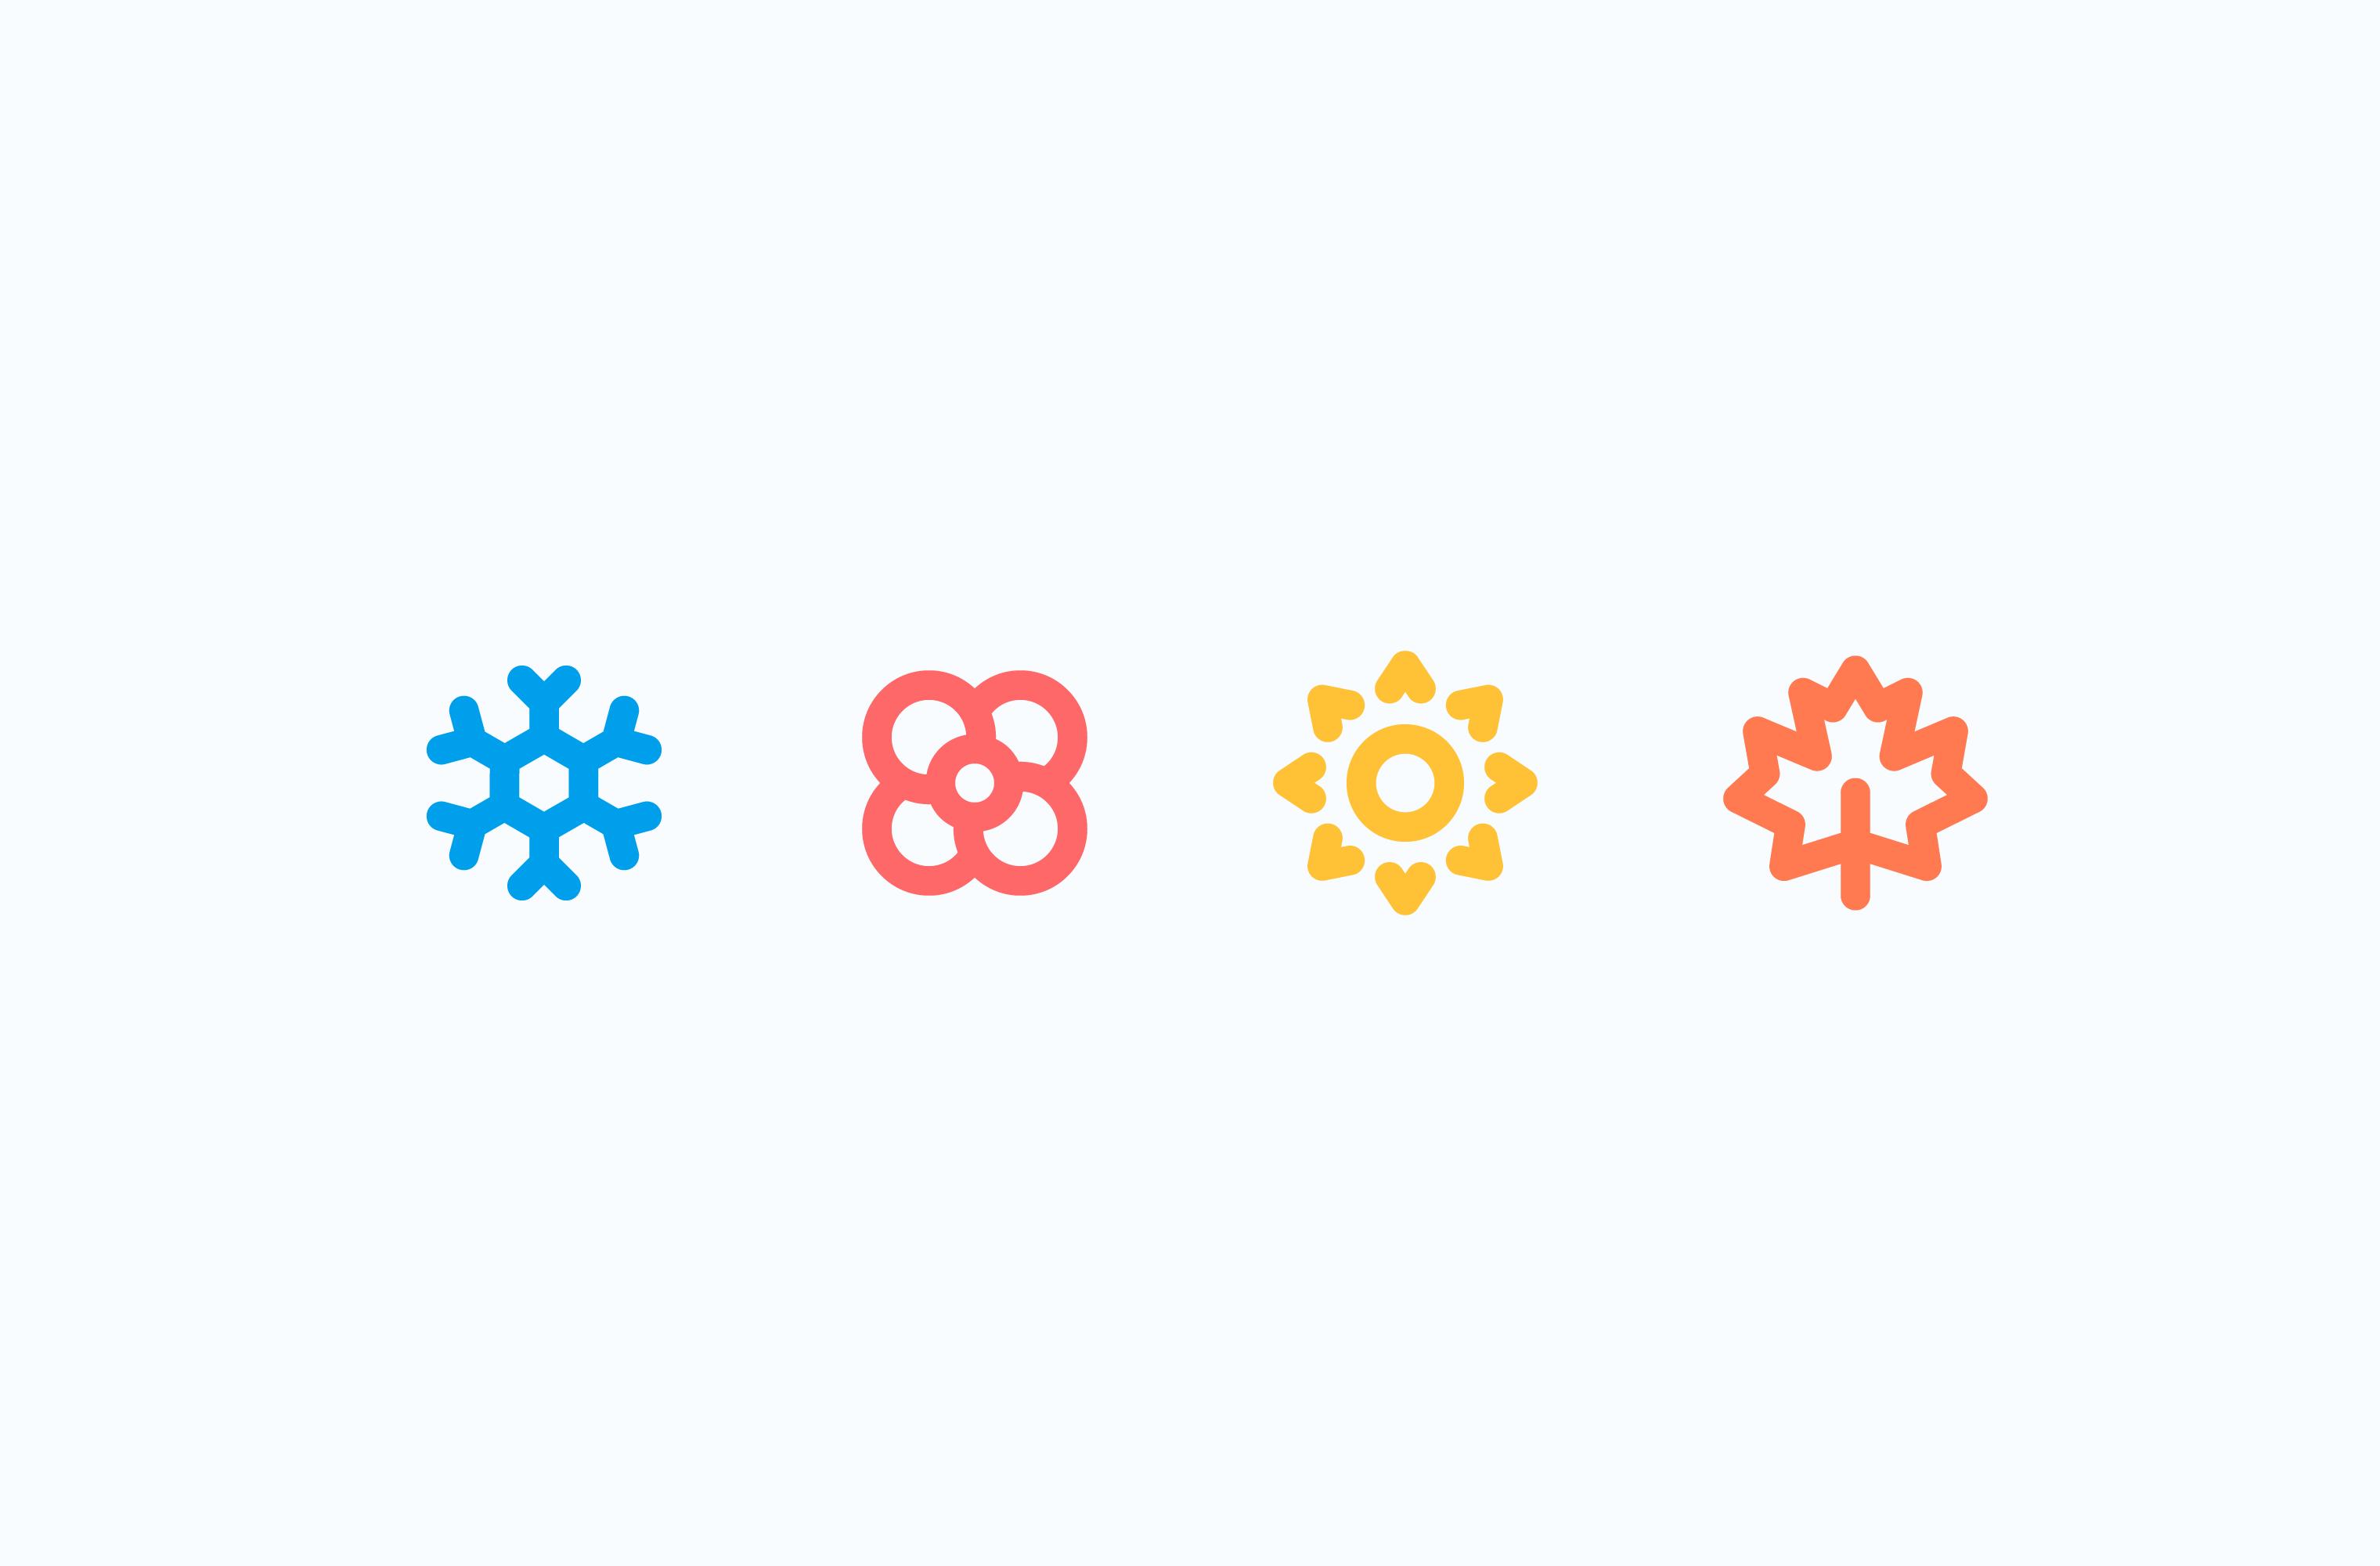 Zephyr Point seasons icon set